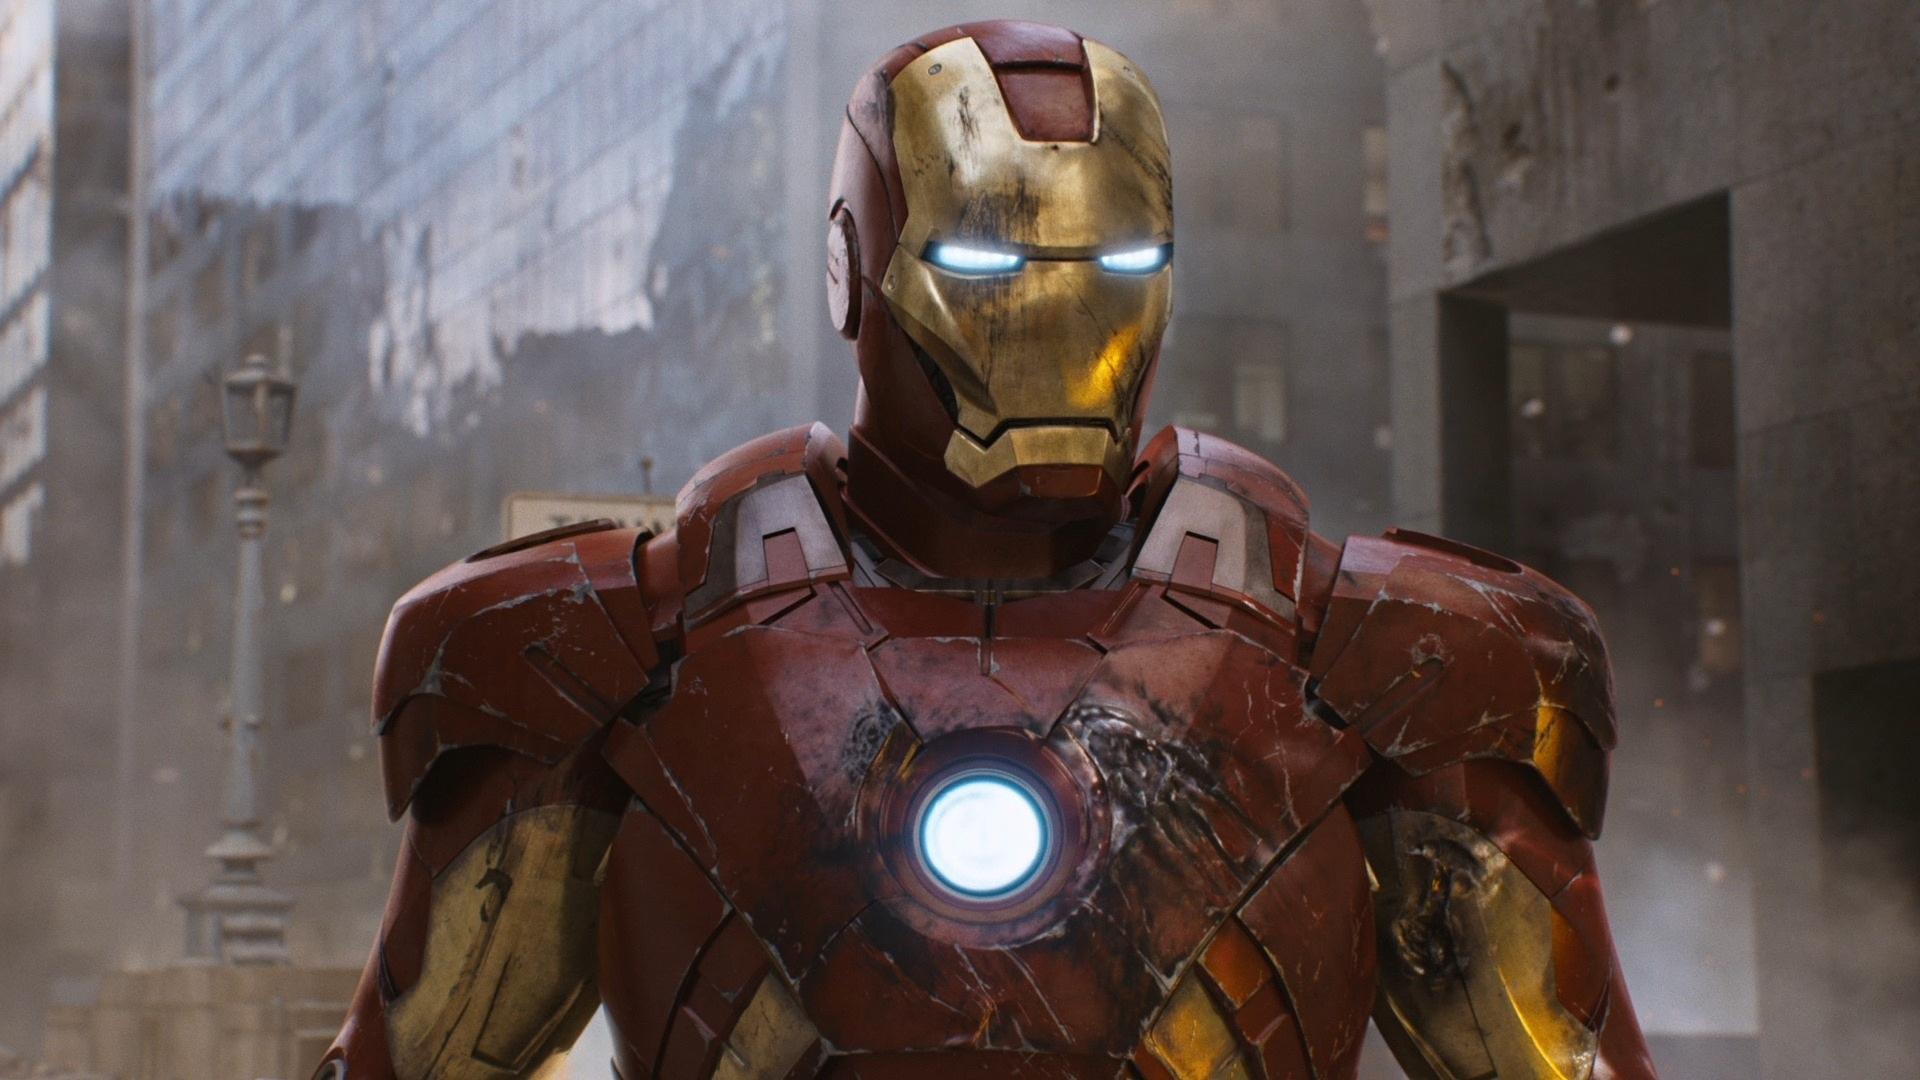 Wallpaper superhero iron man in the avengers 1920x1080 - Avengers superhero wallpaper ...